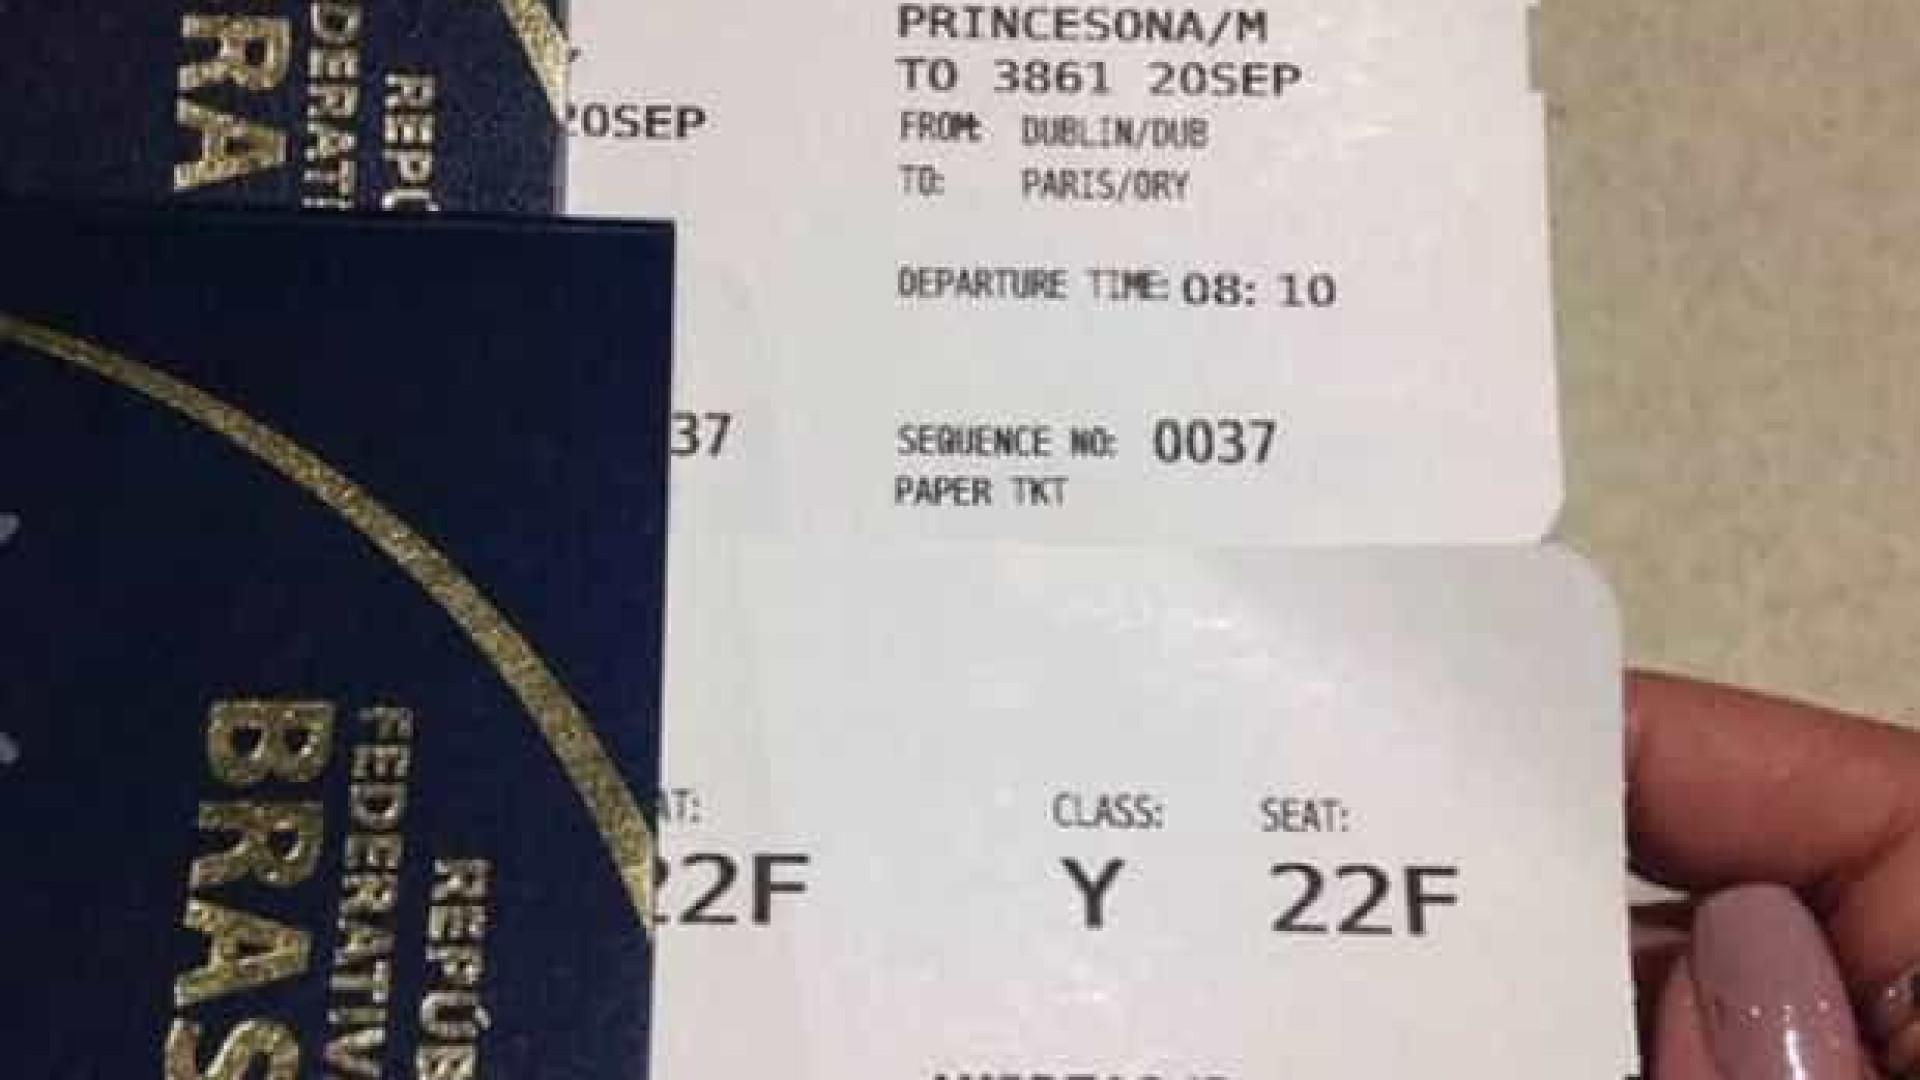 Casal que usou apelidos na passagem consegue embarcar no voo